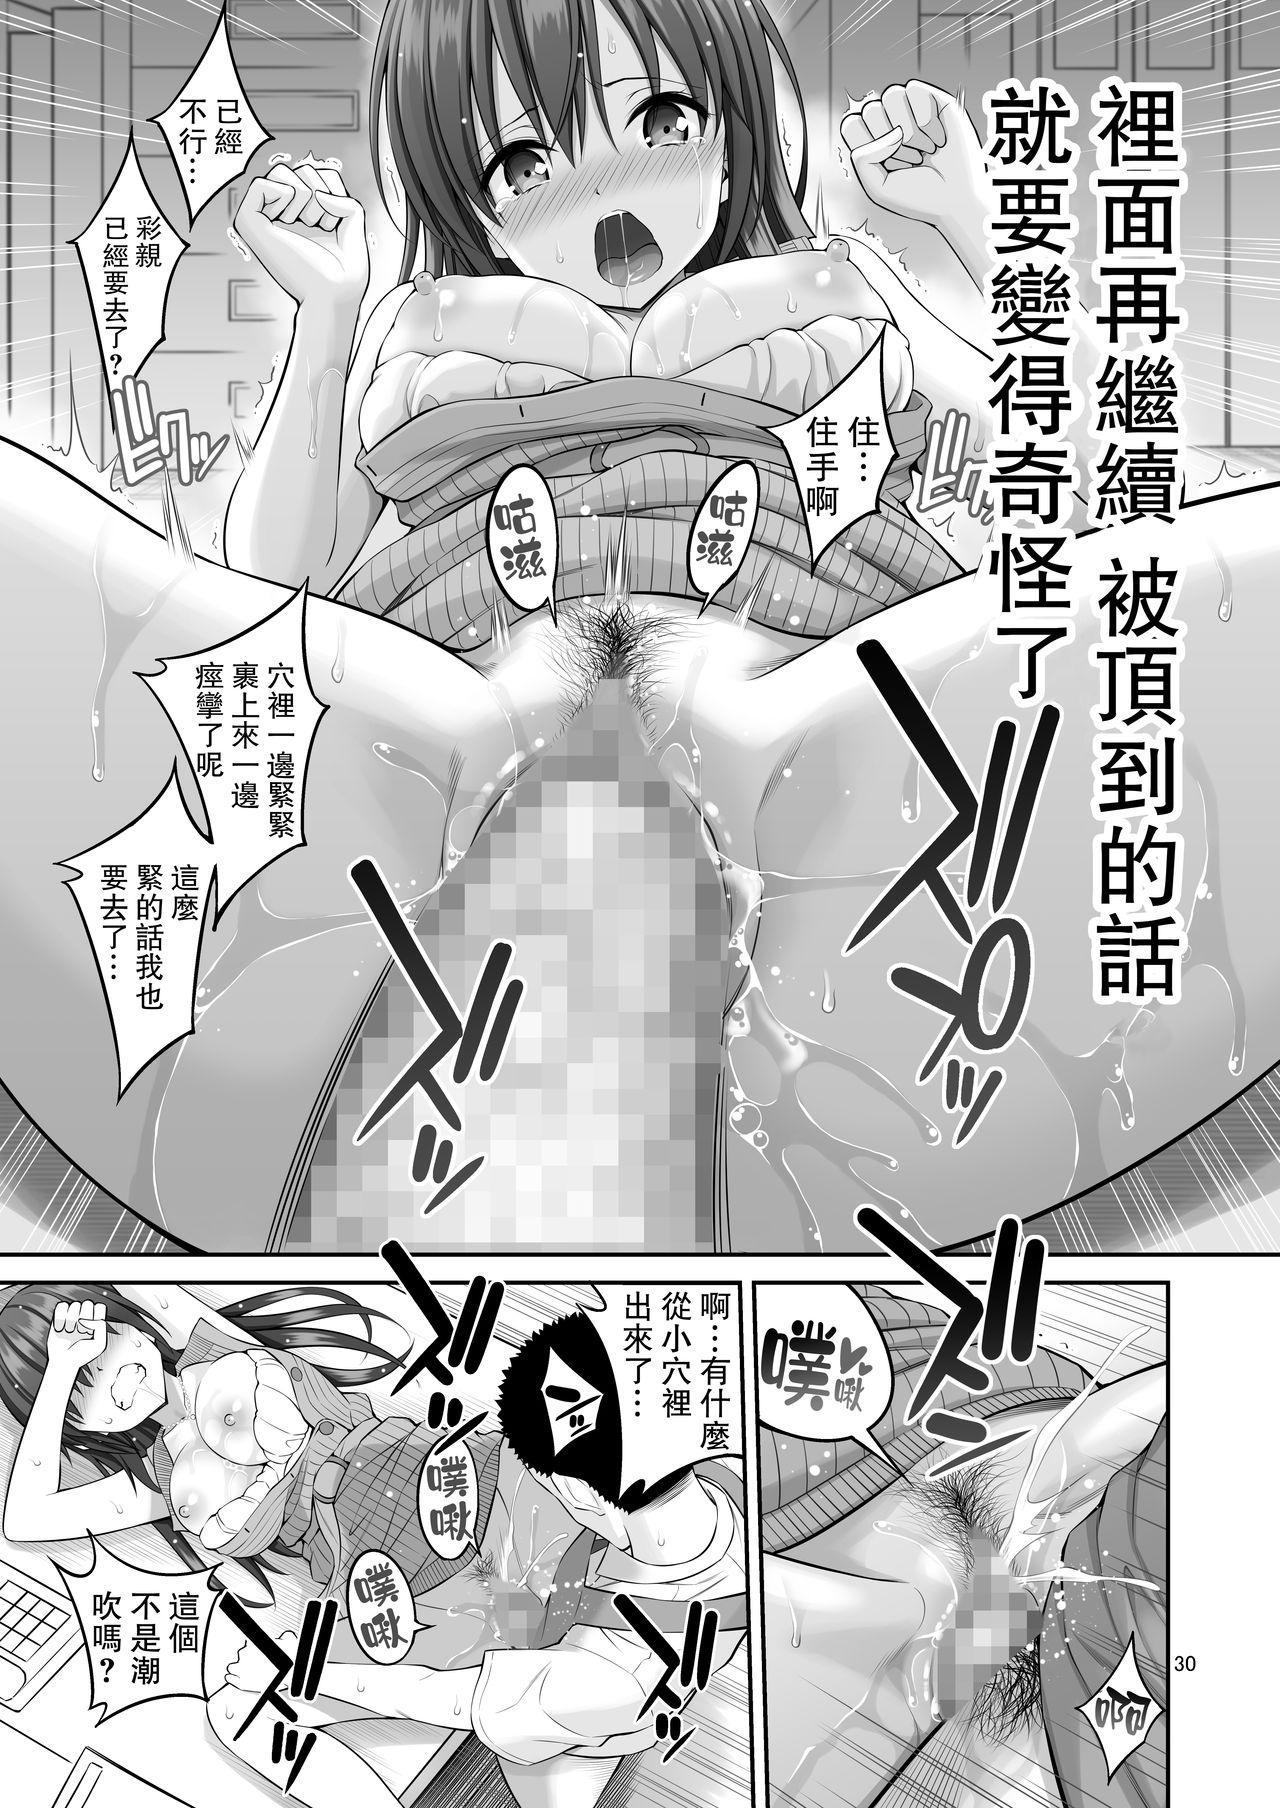 [Popochichi (Yahiro Pochi)] Gisou Manbiki ~Nerawareta Moto Idol Tsuma~ | 偽裝竊盜~被狙擊的前偶像人妻~ [Chinese] [路过的骑士汉化组] [Digital] 29